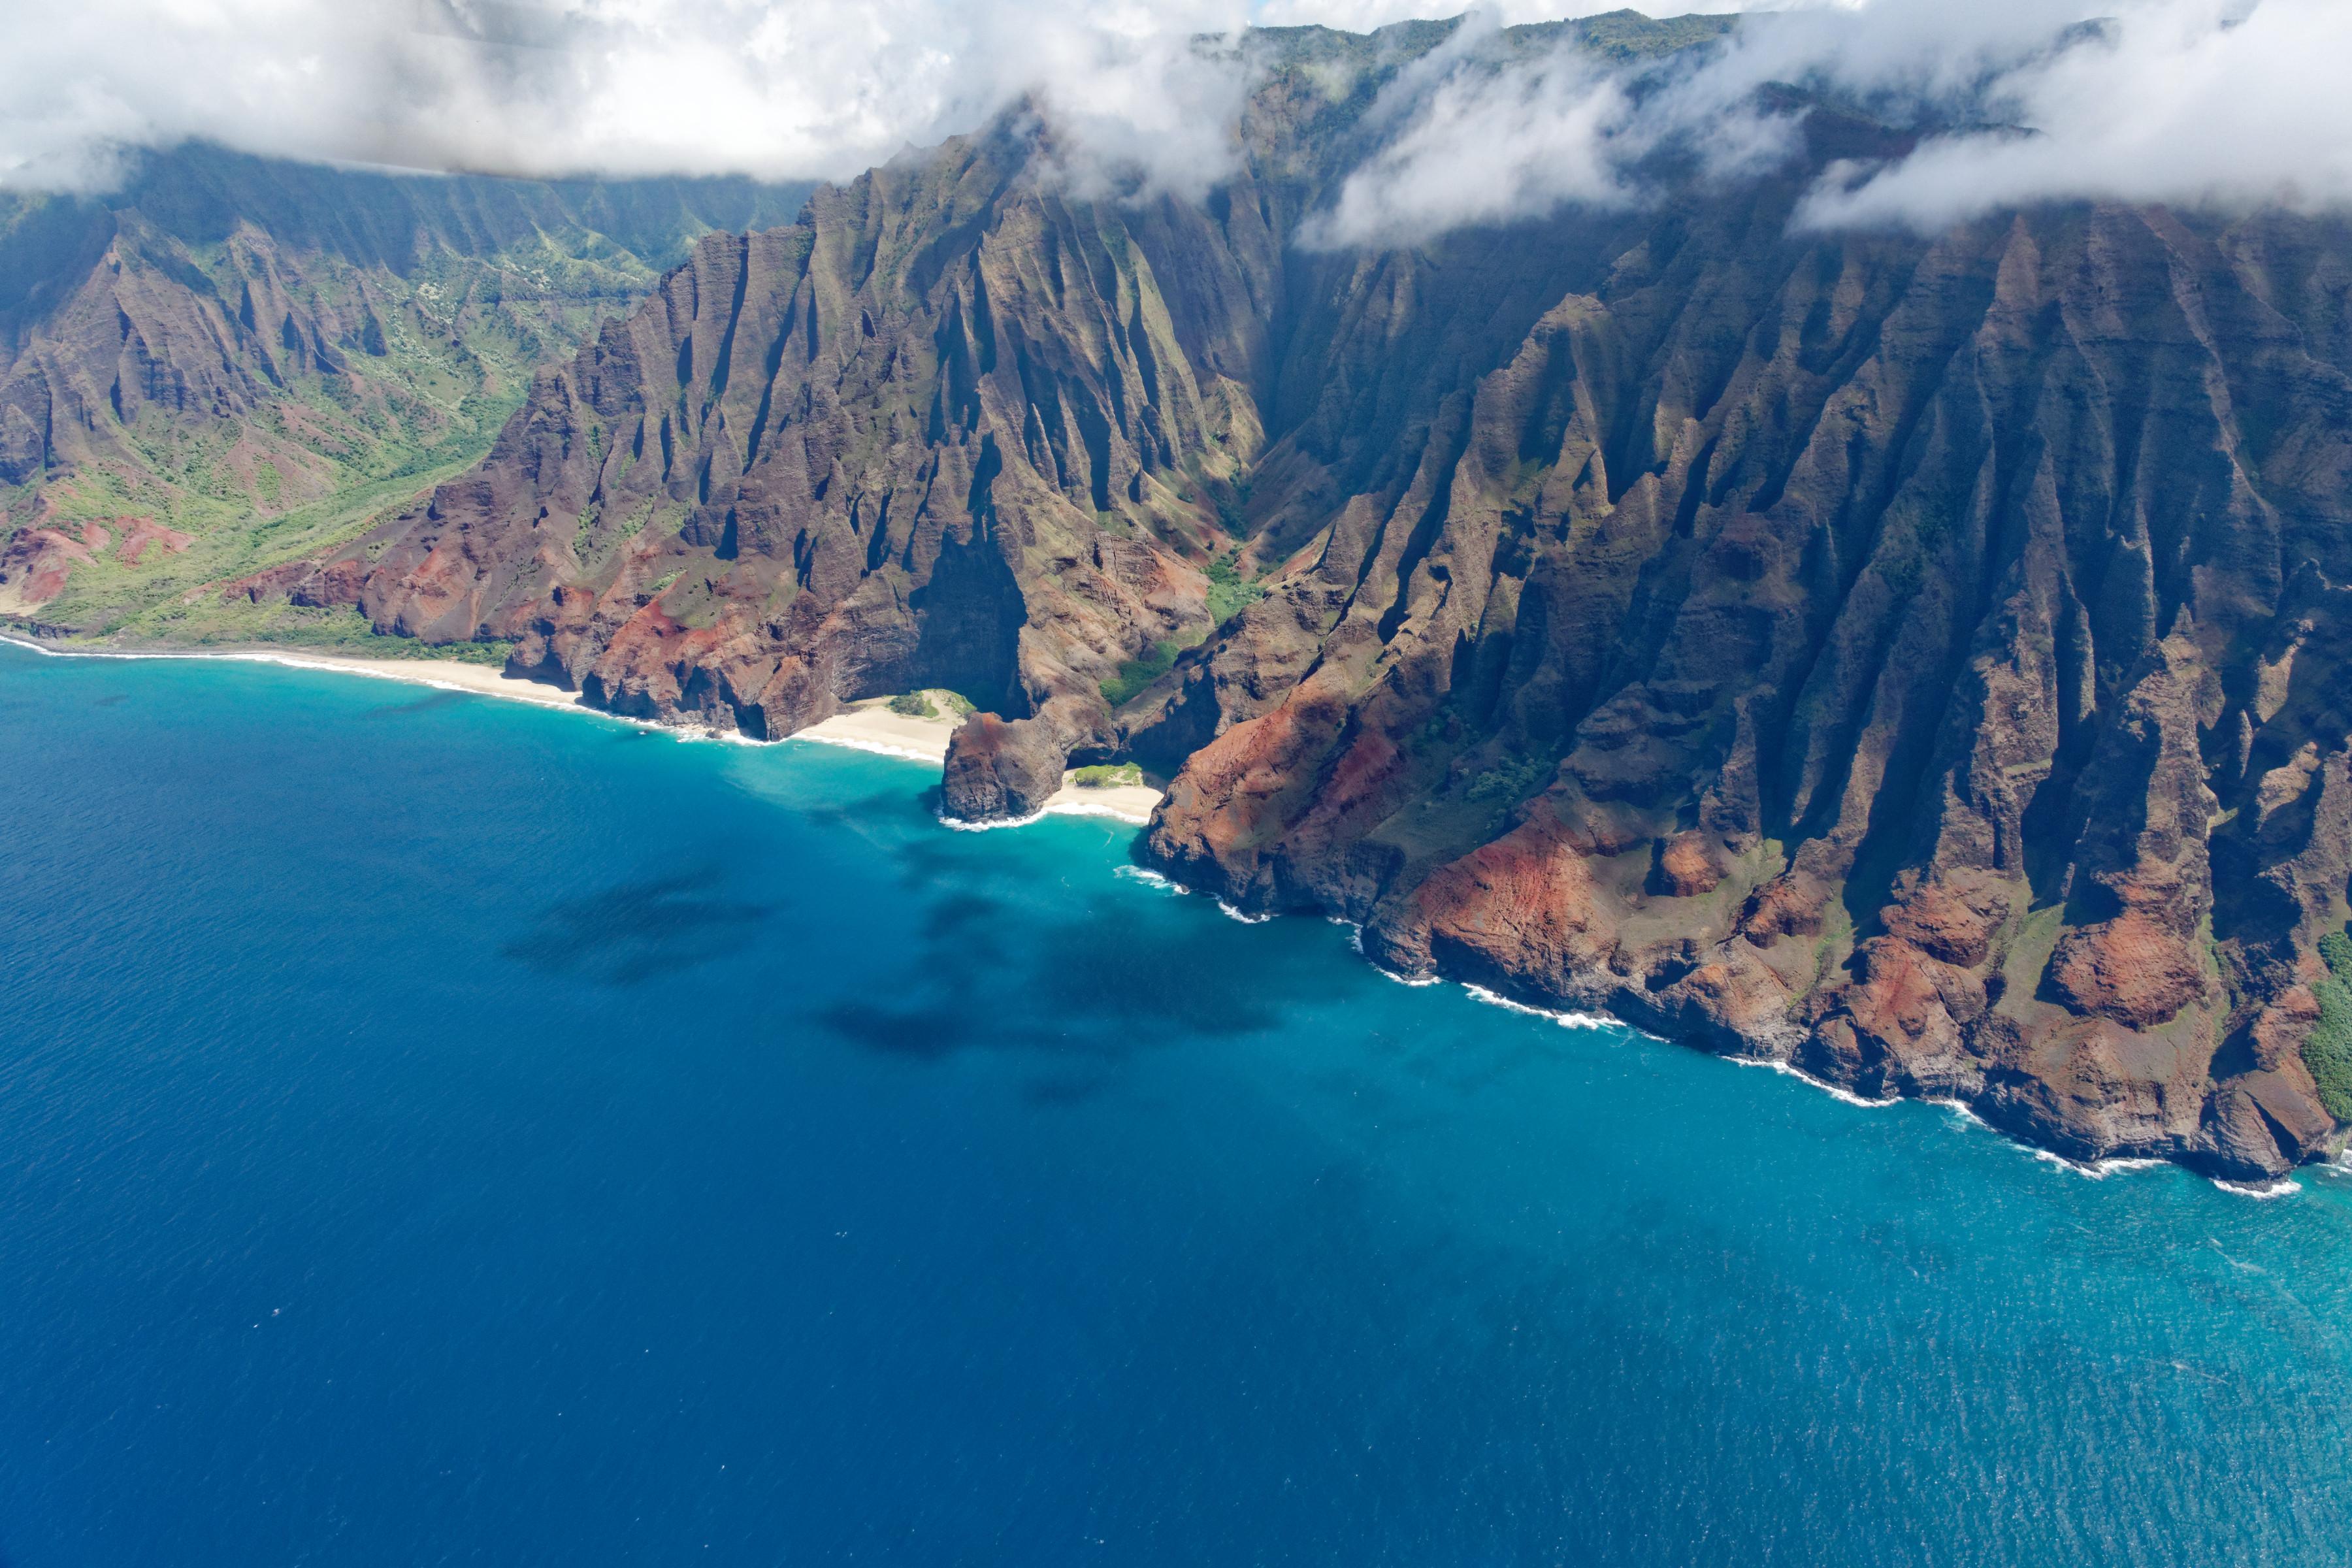 Une vue de la Na Pali coast vue du ciel